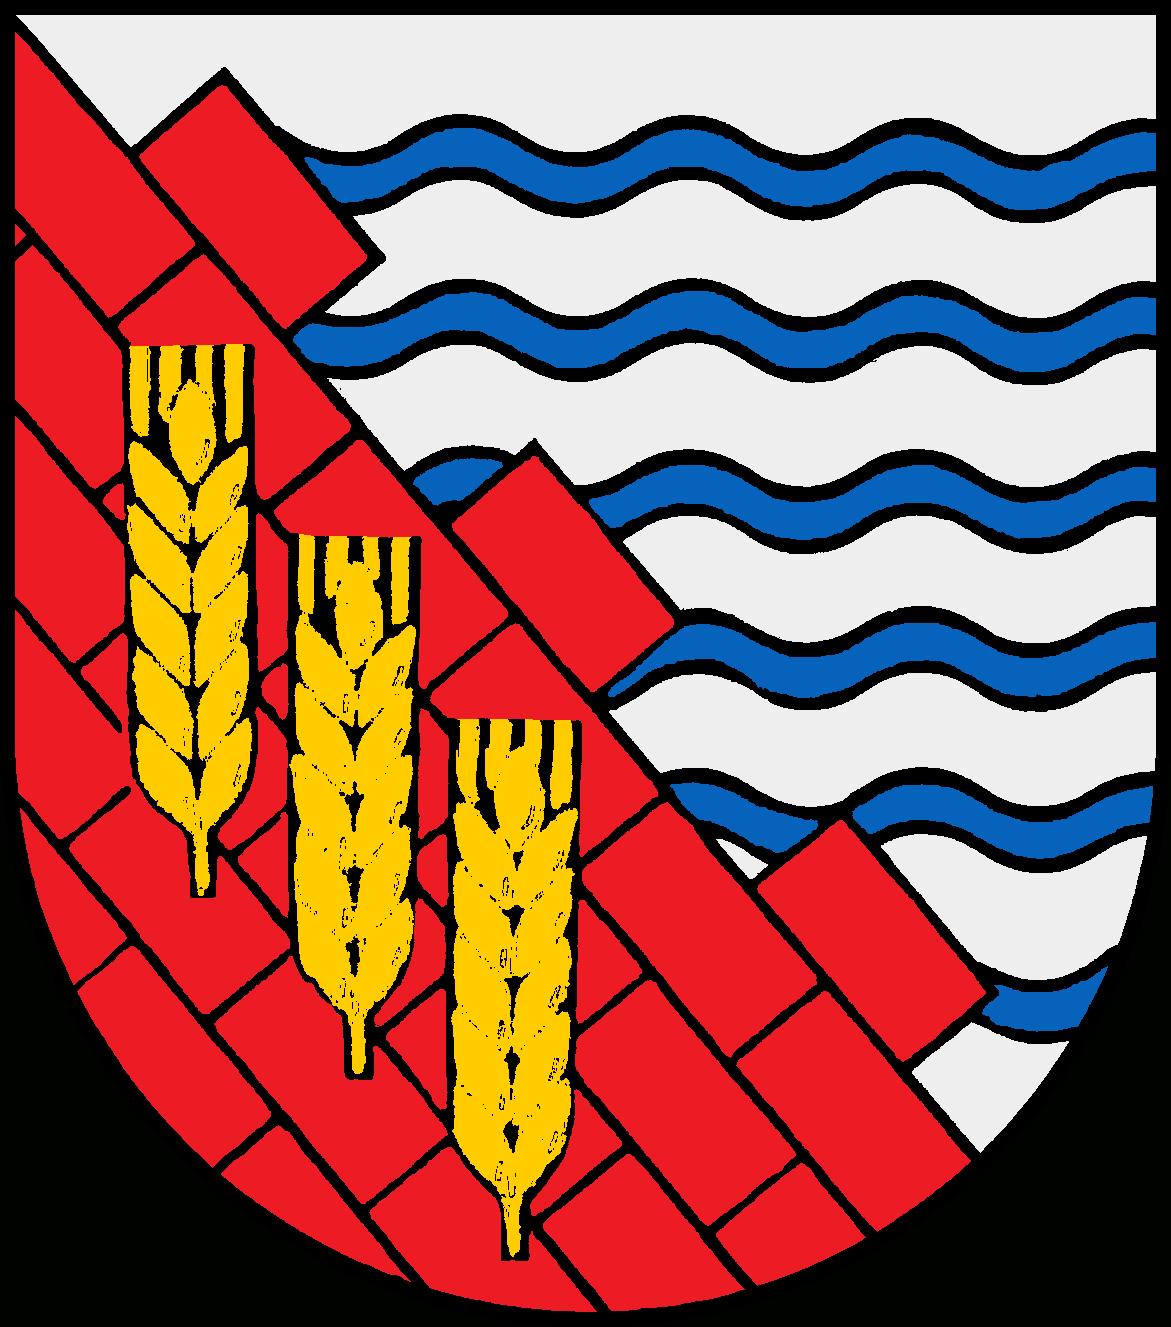 Wahlstorf (Holsten) - Wikipedia, den frie encyklopædi